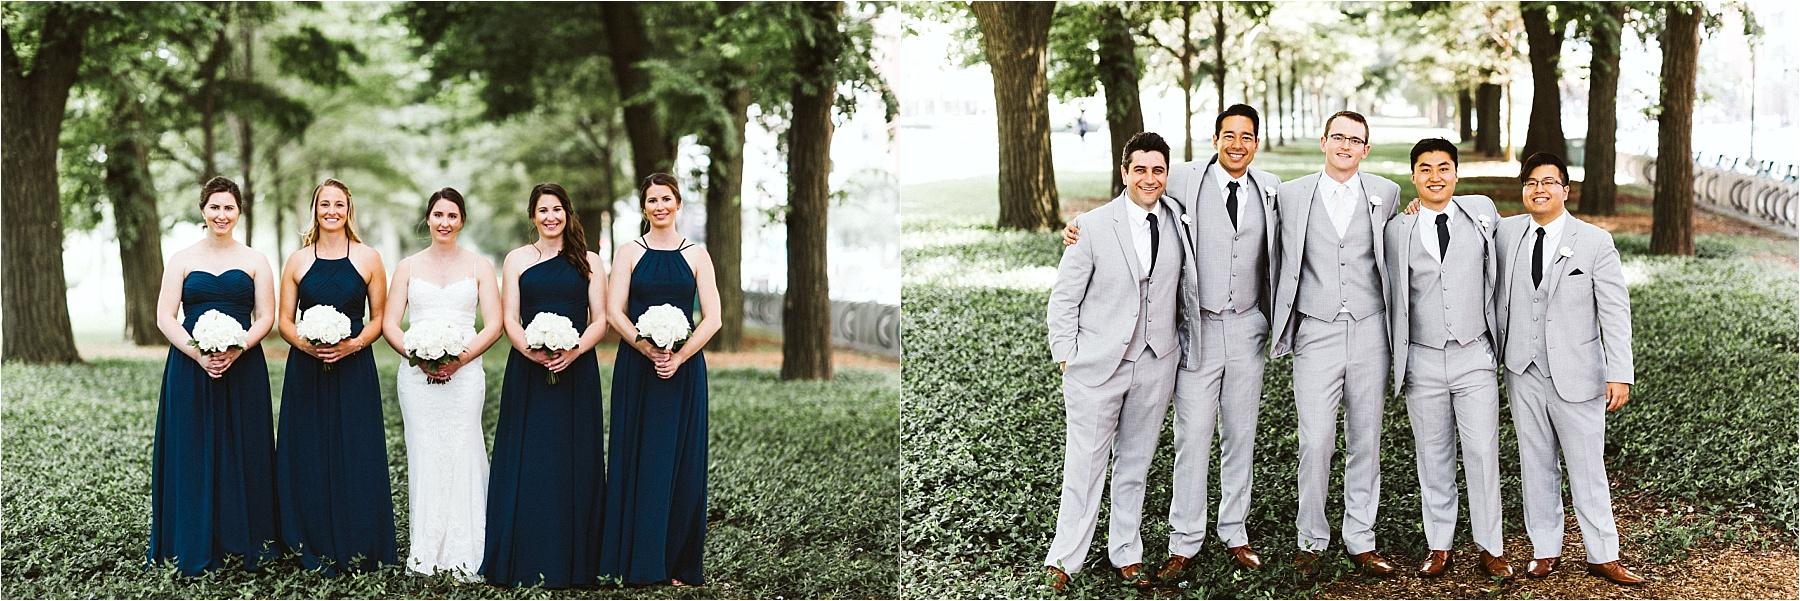 Chicago Field Museum Wedding_0061.jpg